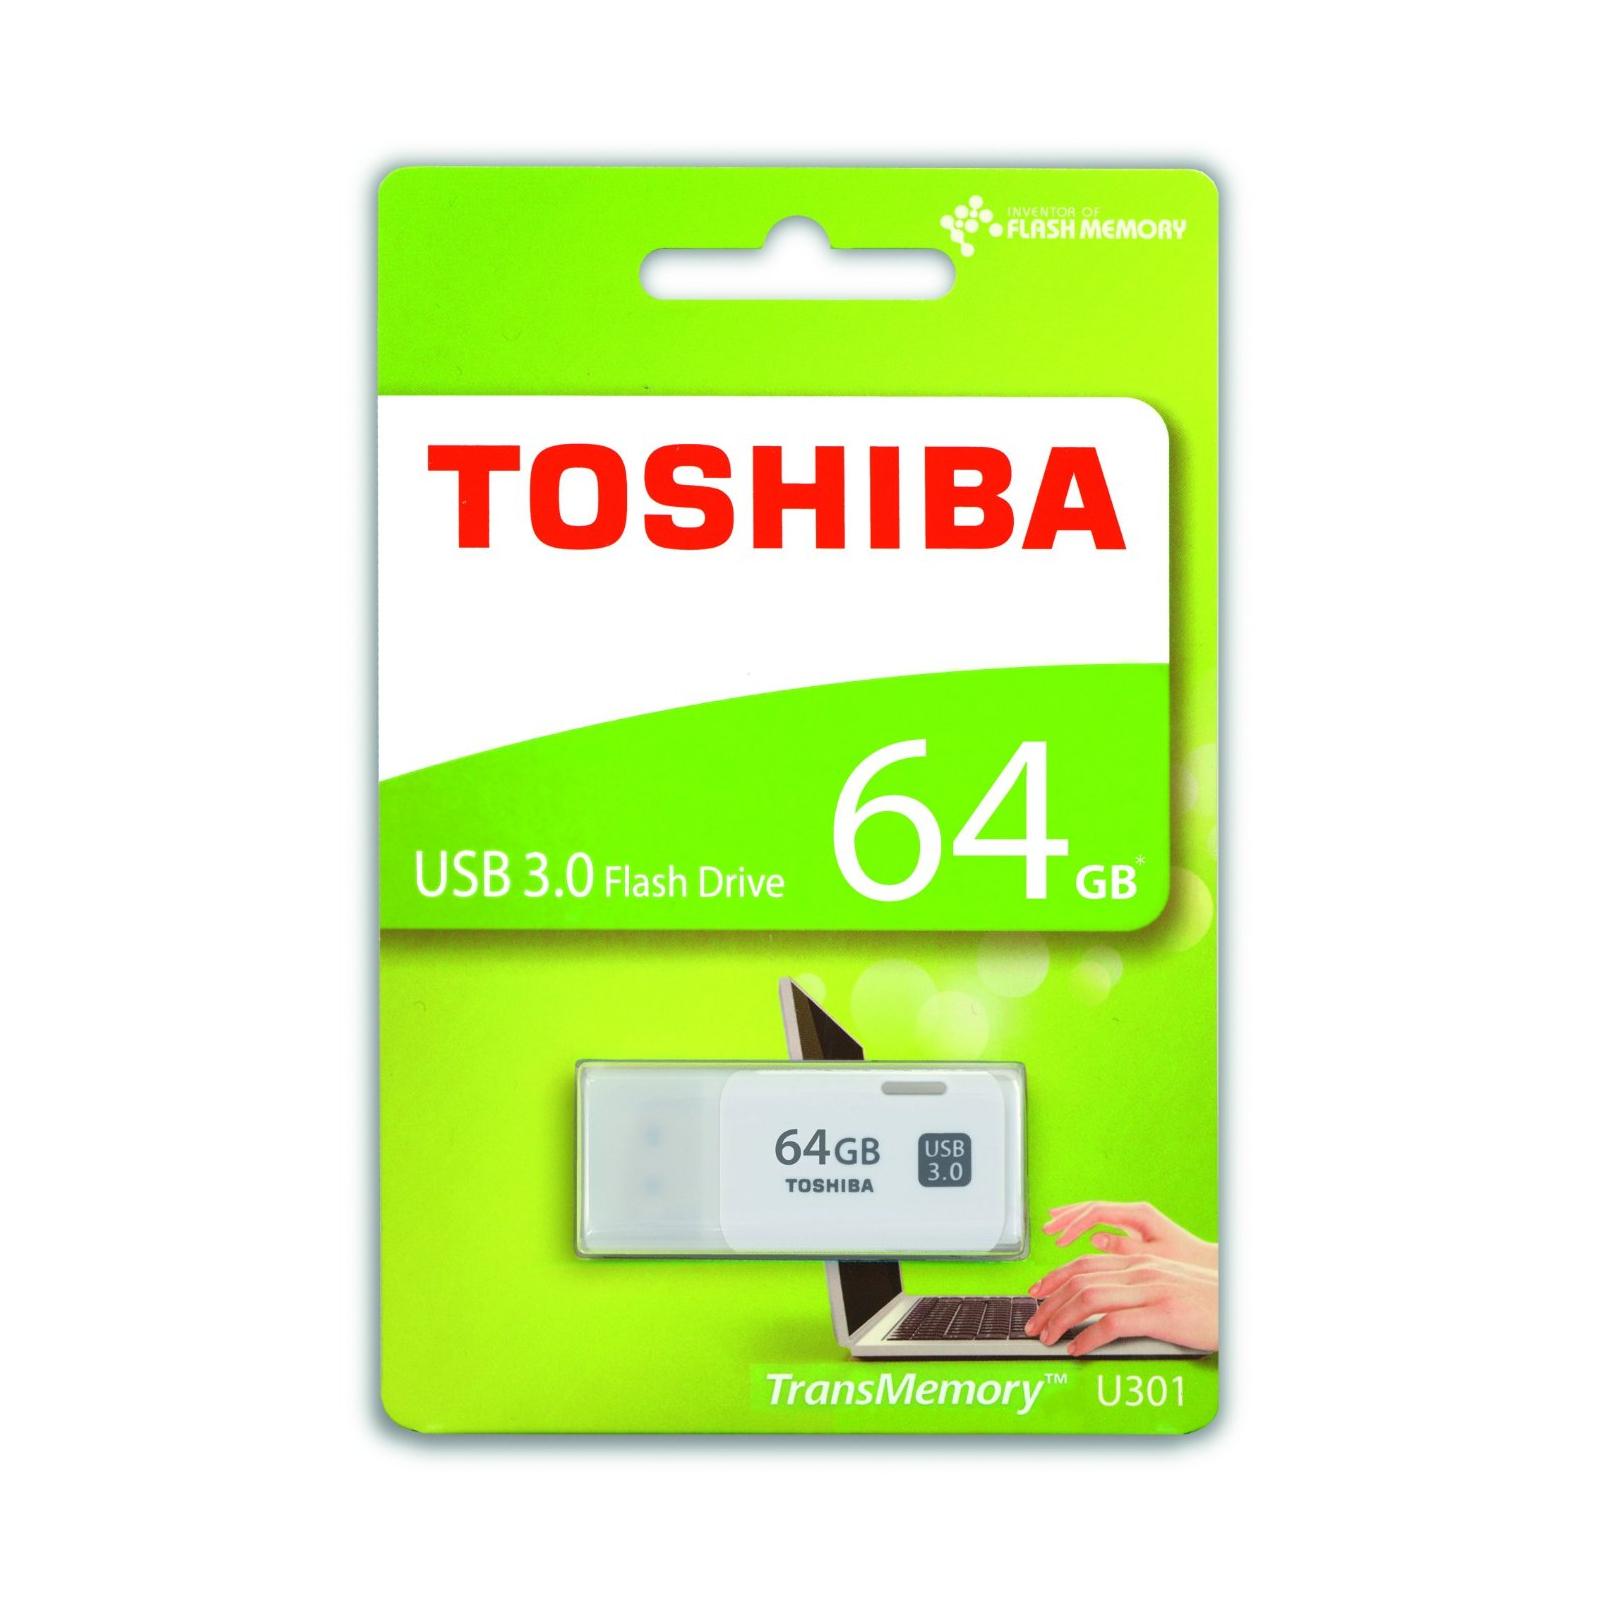 USB флеш накопитель TOSHIBA 64GB HAYABUSA USB 3.0 (THN-U301W0640E4) изображение 3